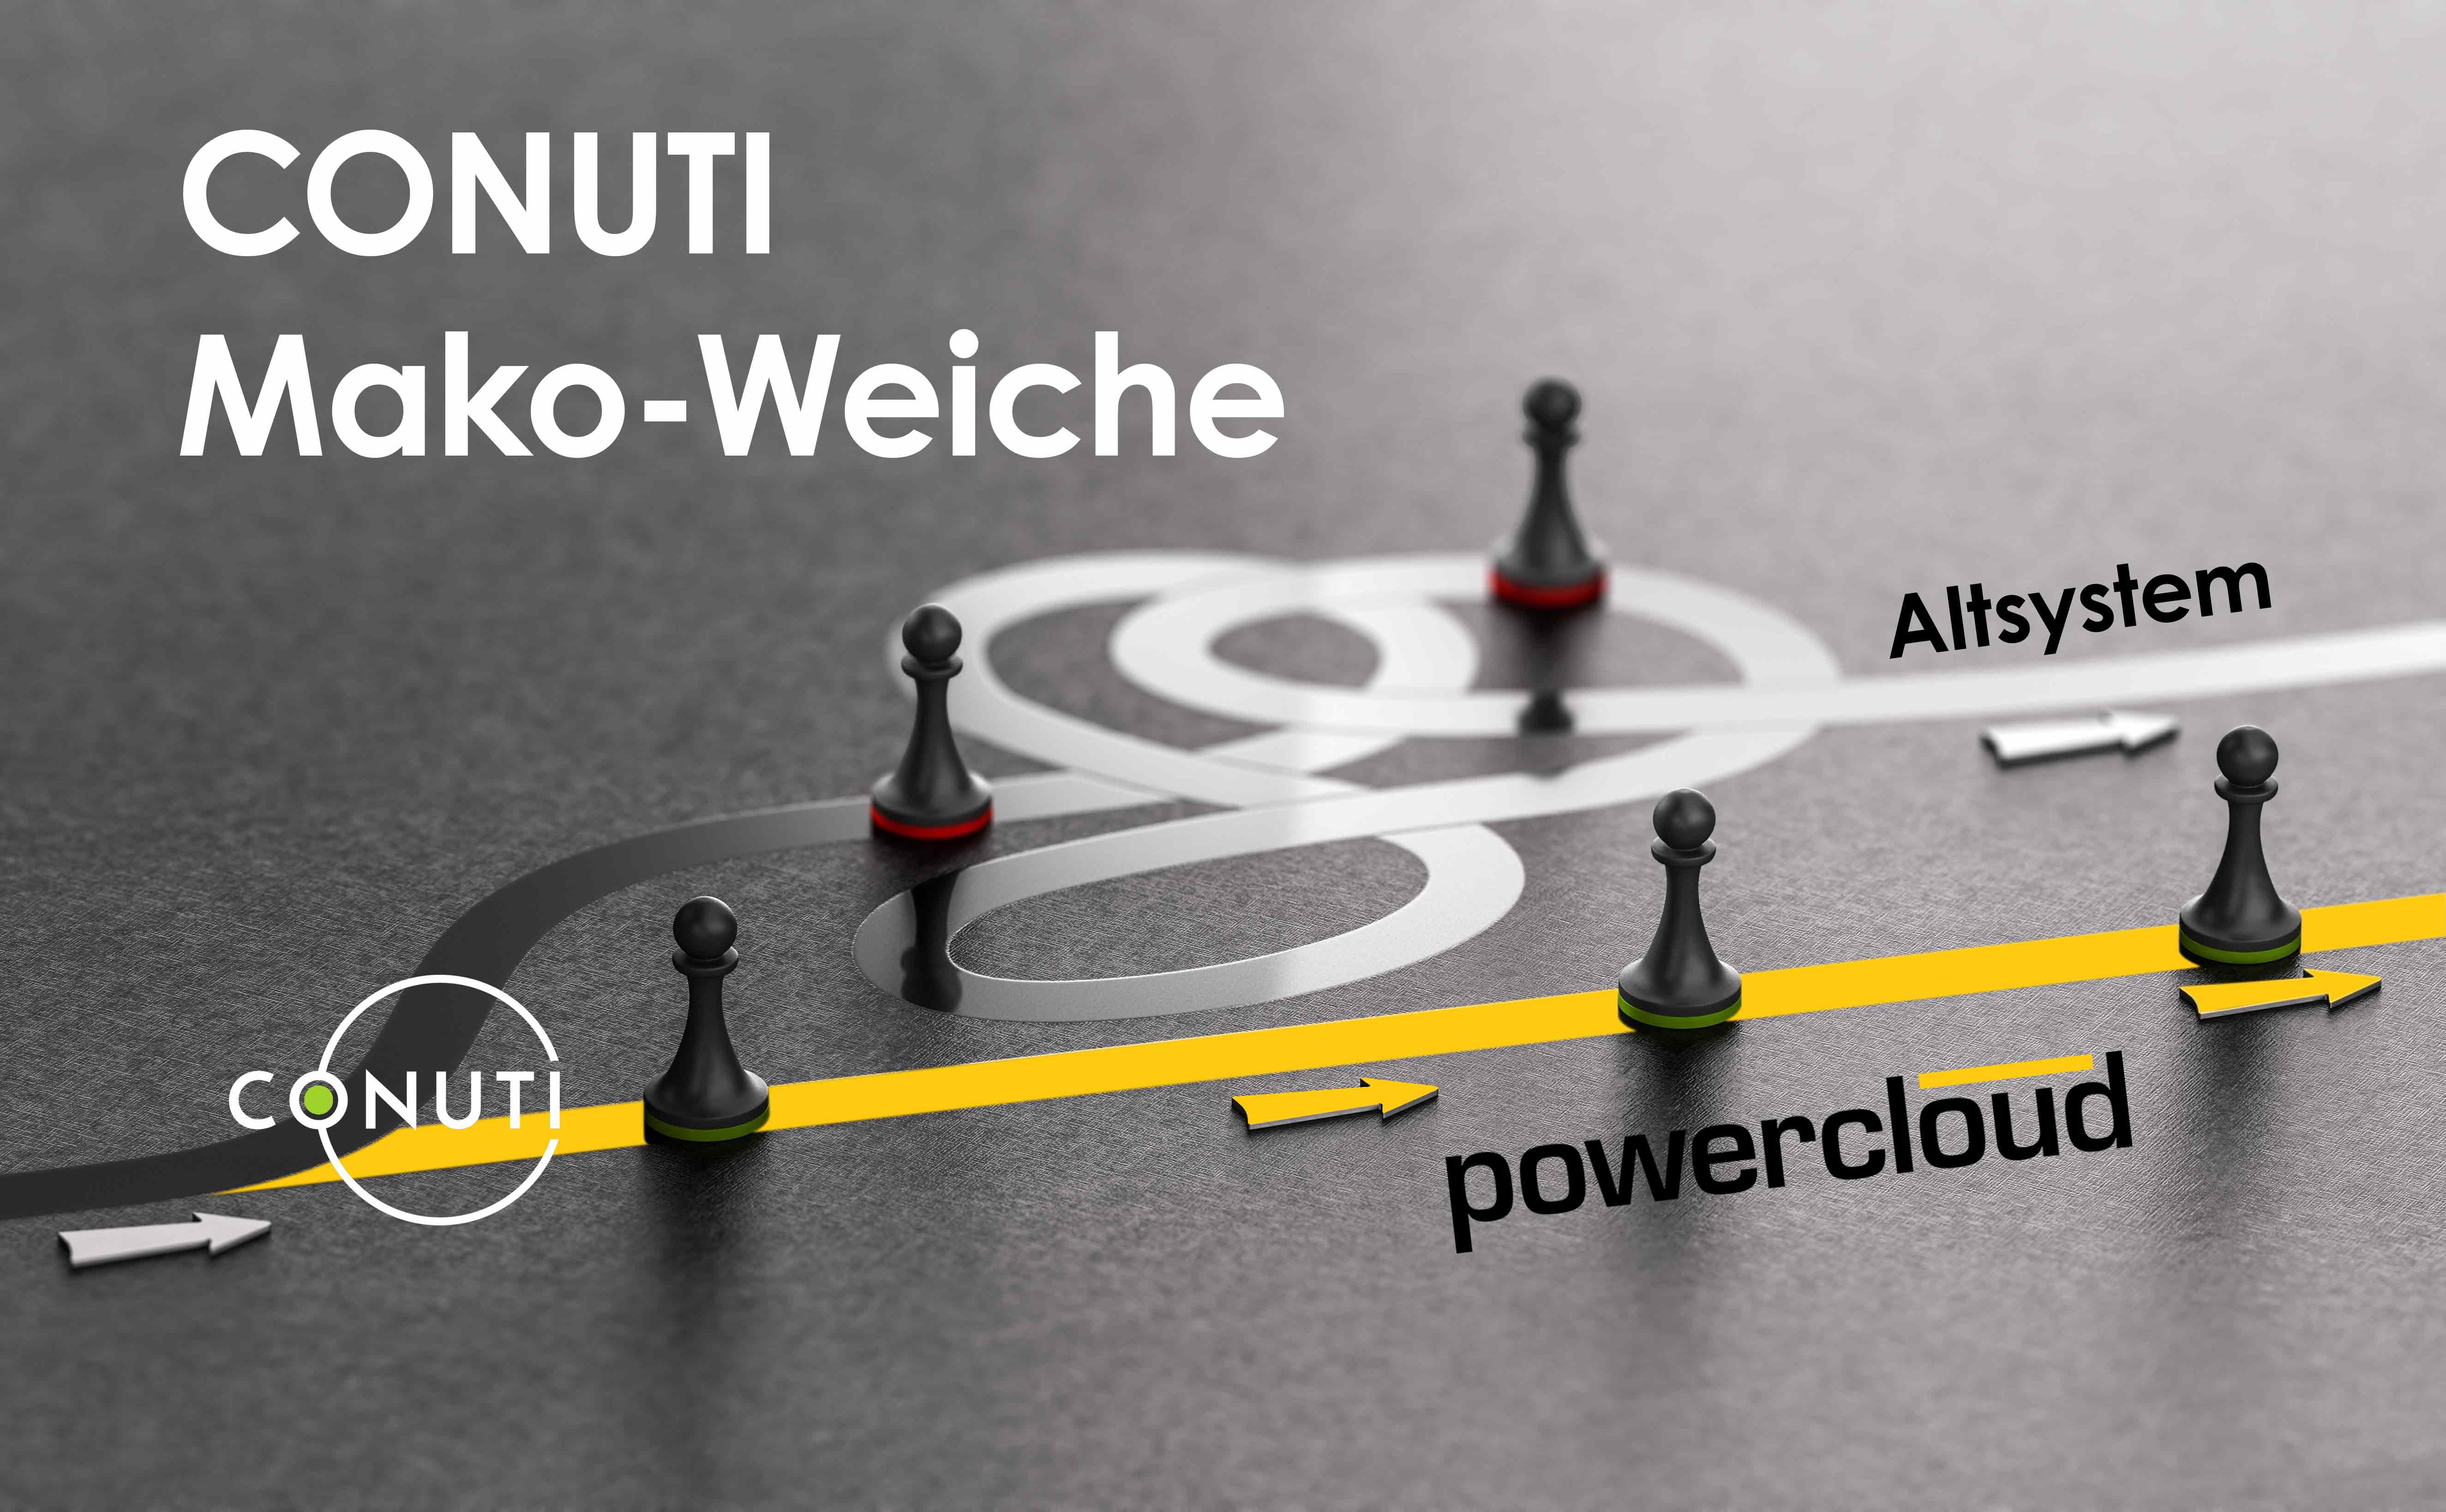 CONUTI-Mako-Weiche_Highway